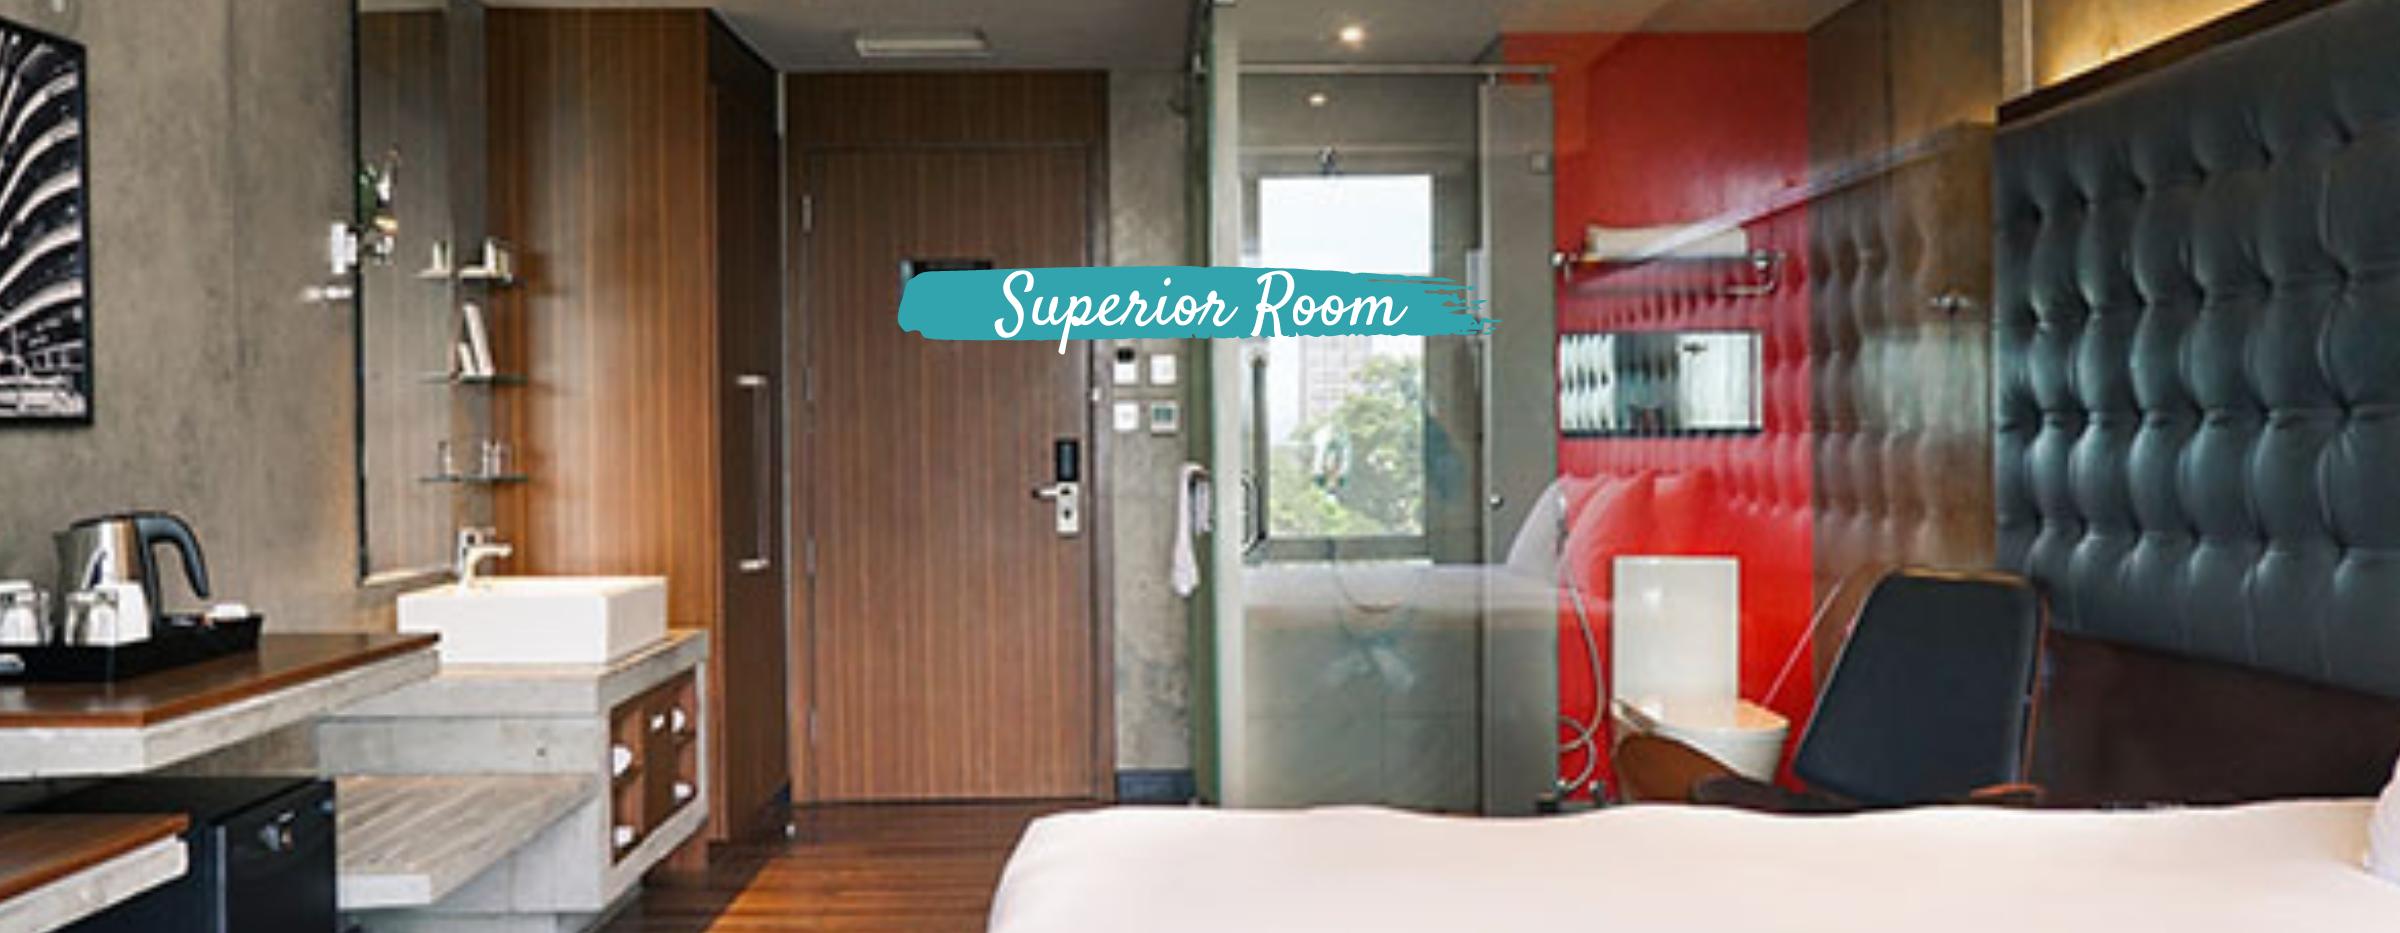 Interior of a superior room in B hotel in Quezon City